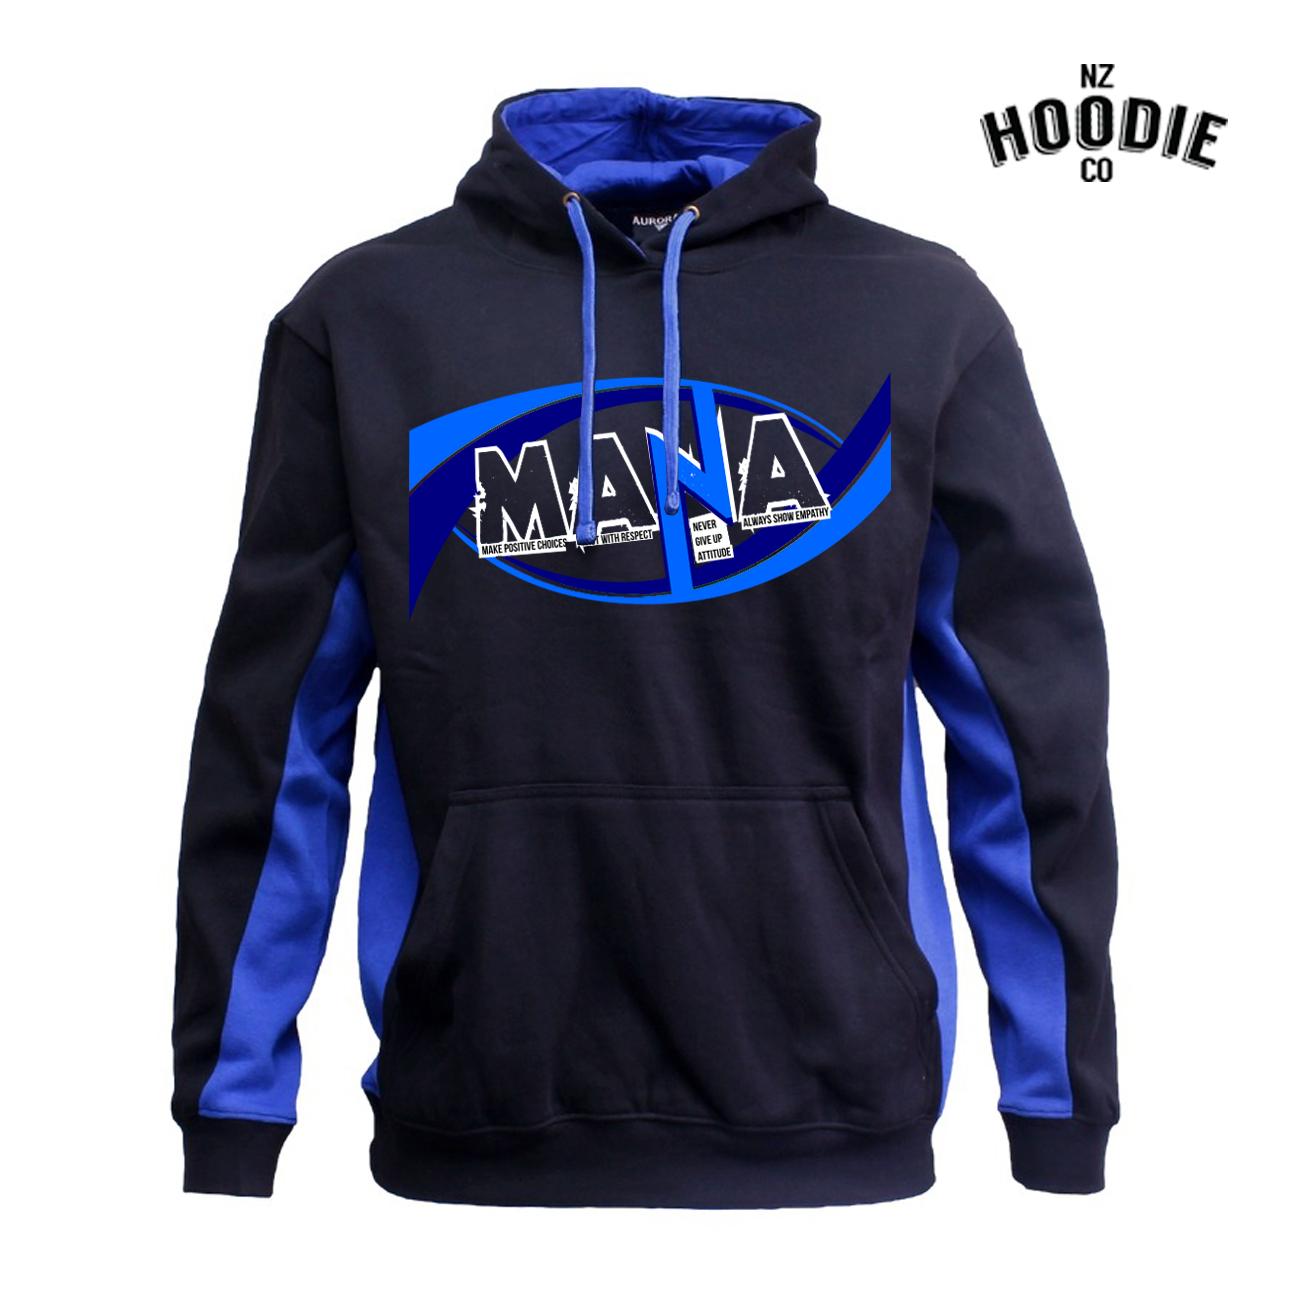 LARGE Mana Design on Aurora Matchpace Hoodie BLACK & ROYAL.jpg